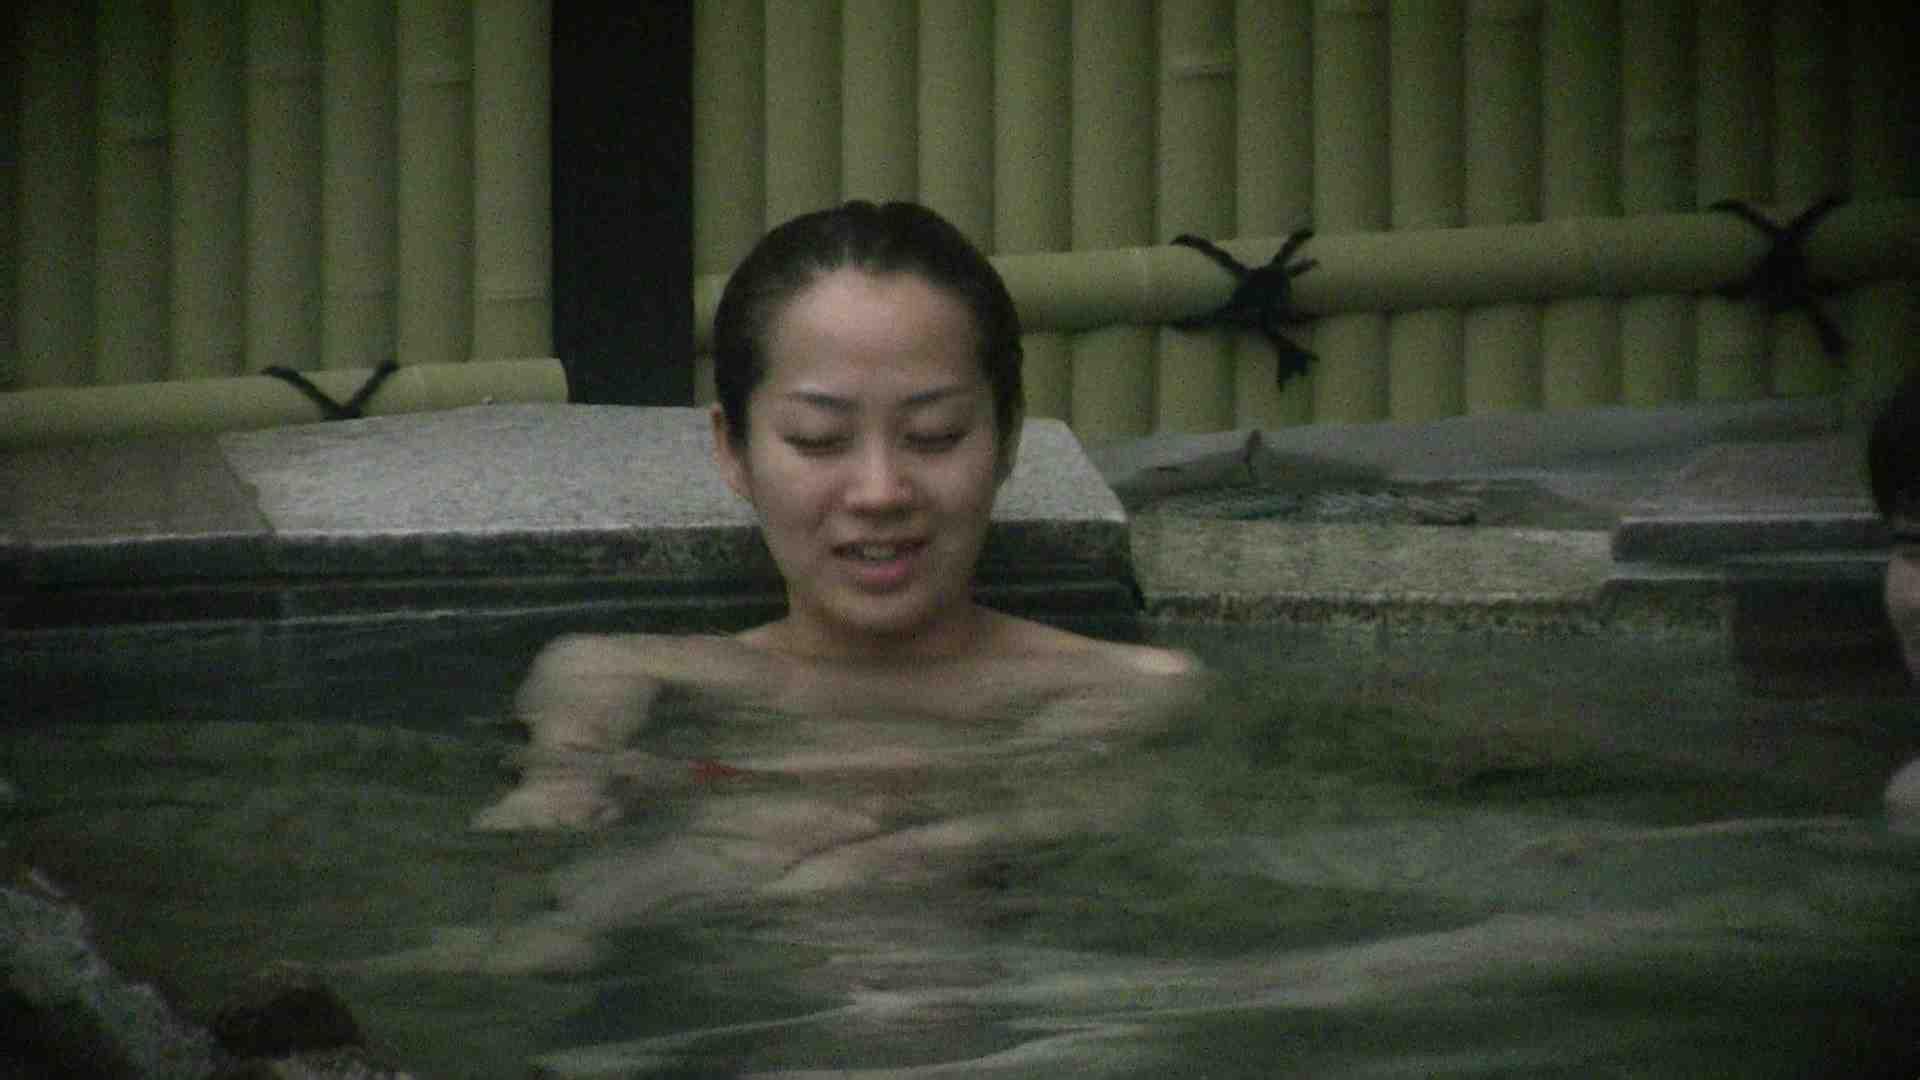 Aquaな露天風呂Vol.539 OL女体 | 露天  88連発 31